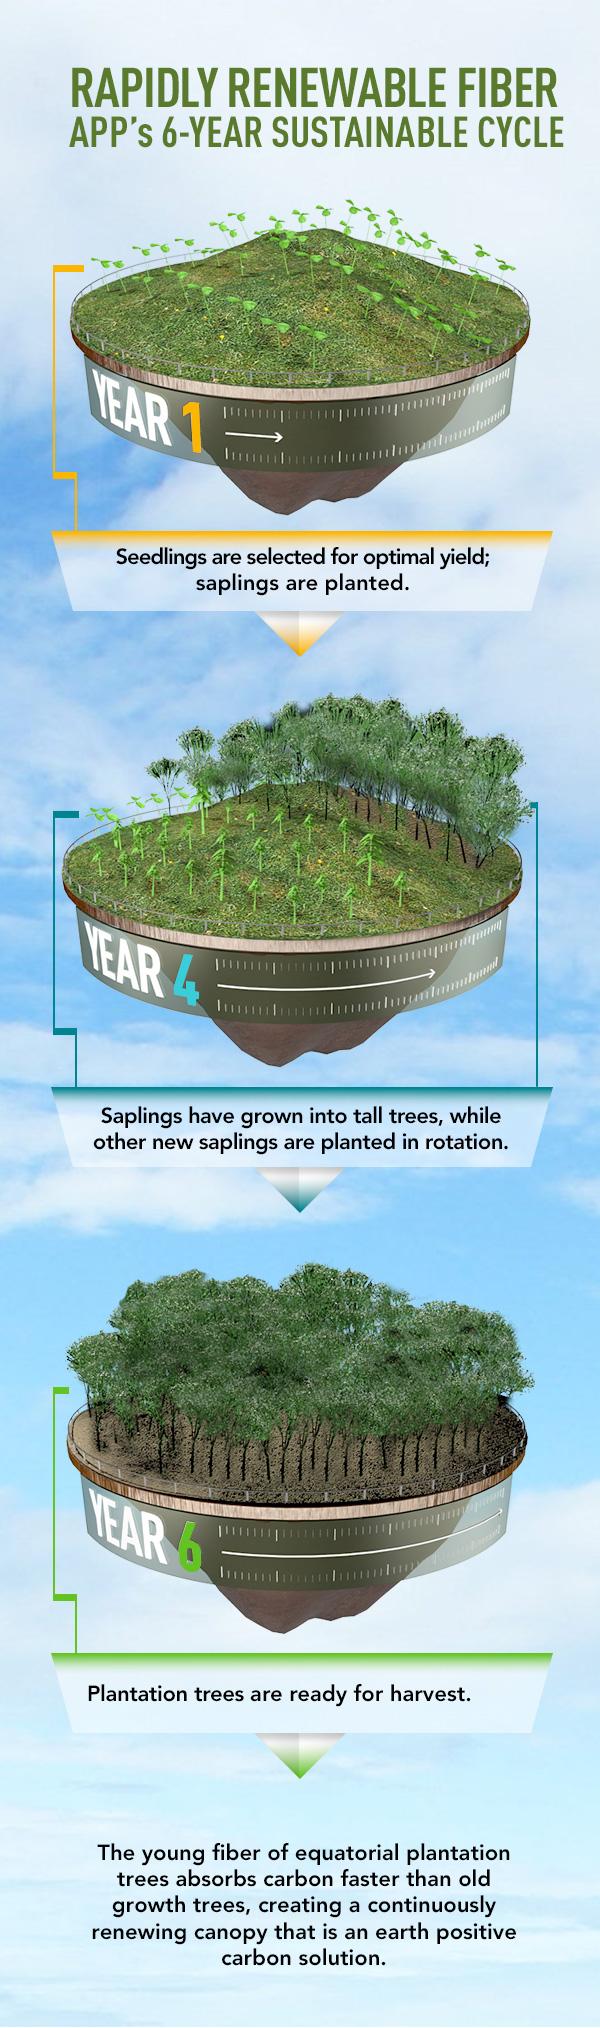 APP_tree_plantation_cycle.jpg